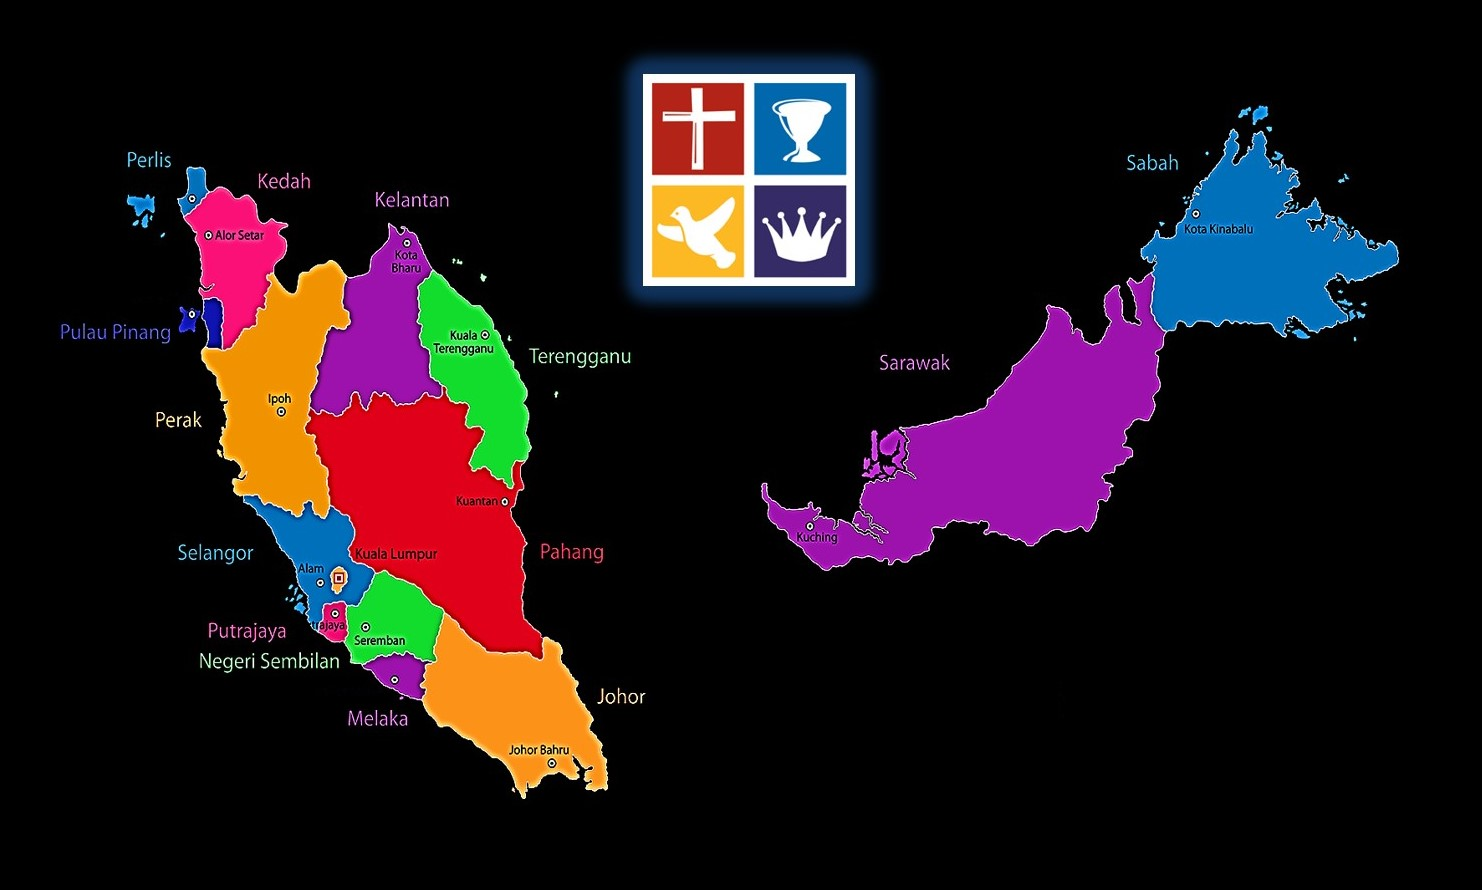 4Sq map